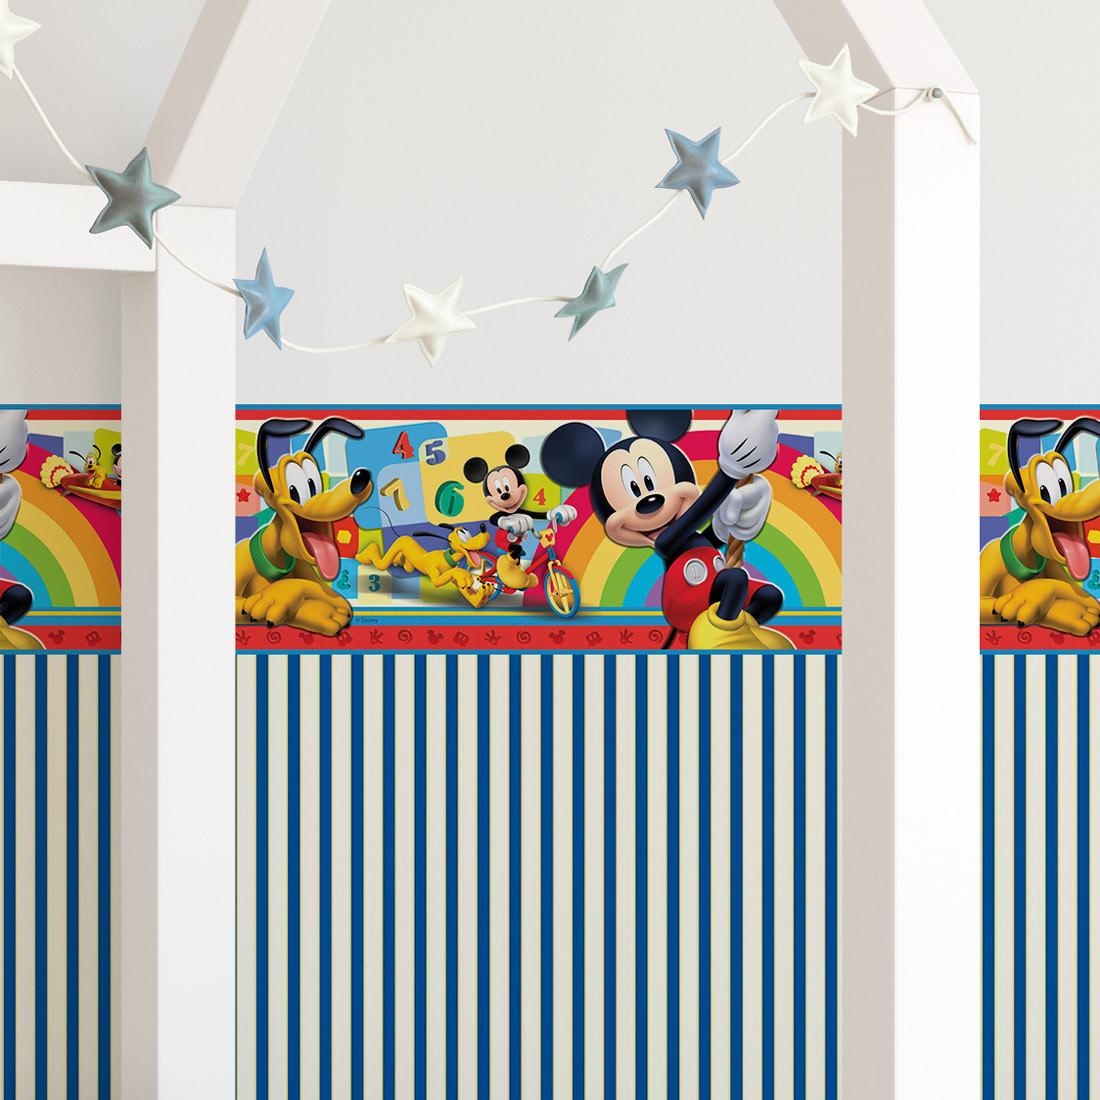 Faixa Decorativa Infantil Mickey Mouse e Pluto - Disney